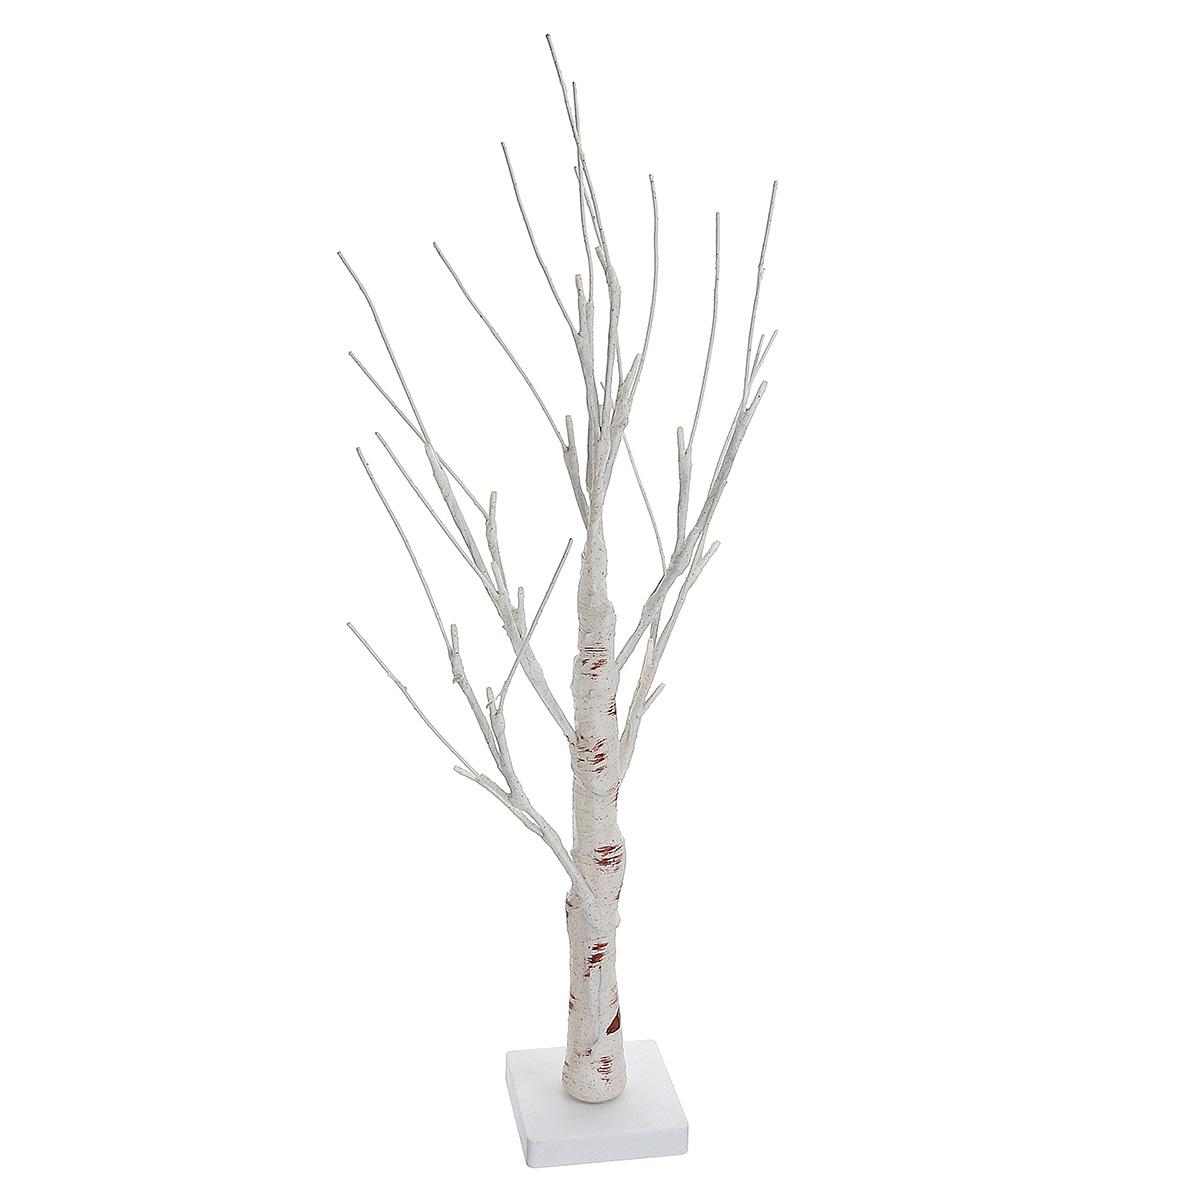 60cm Battery Power Silver Birch Led Tree Lamp Warm White